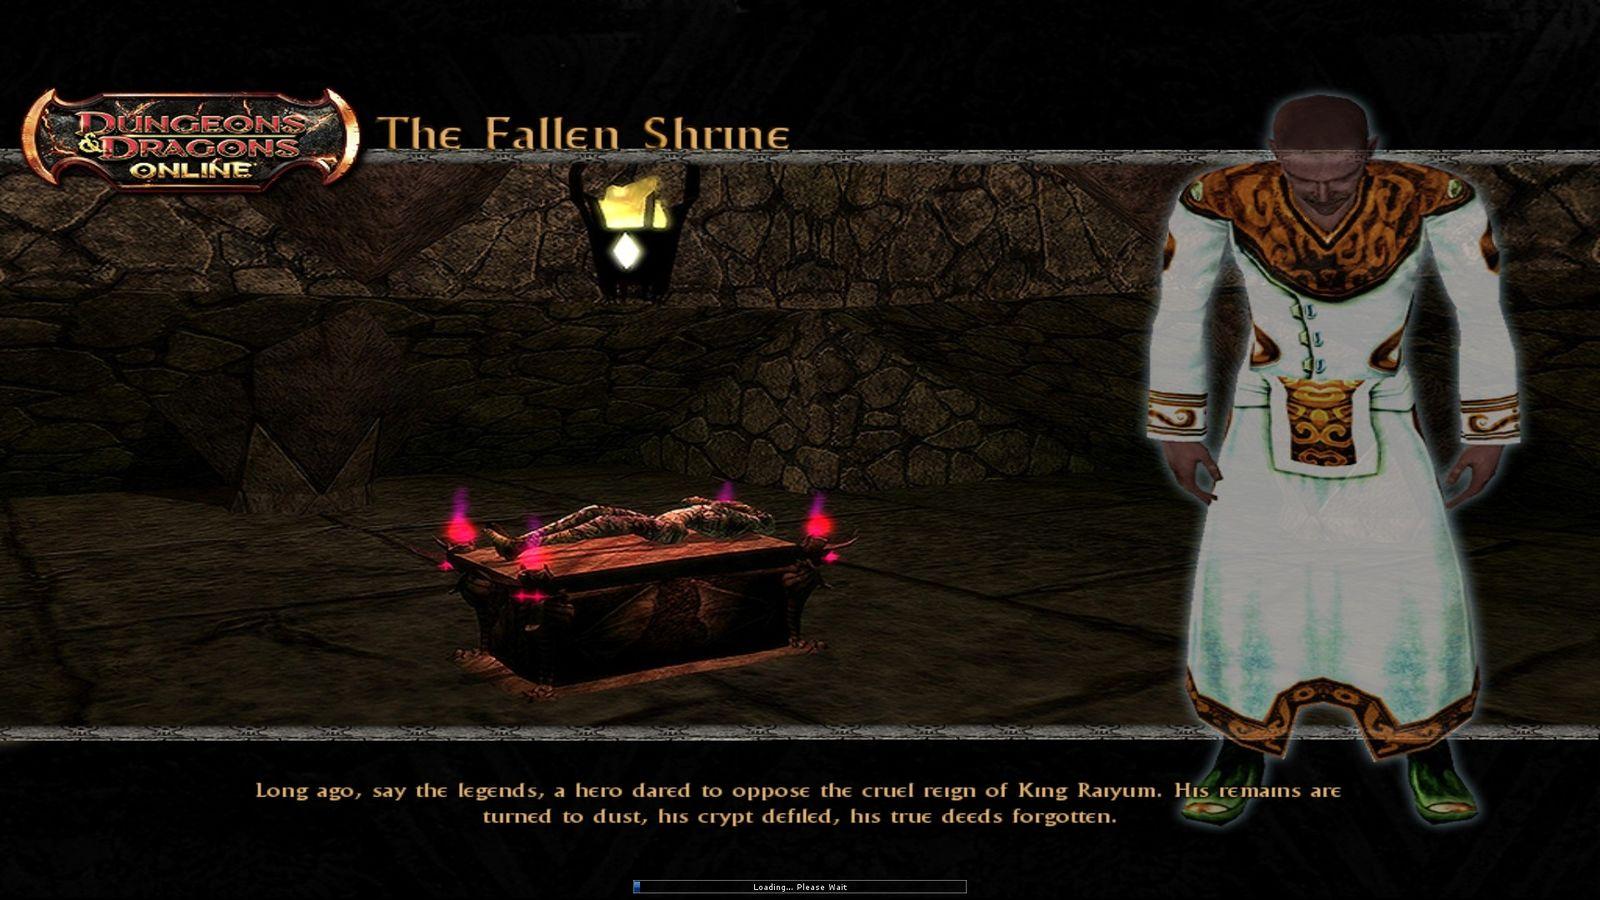 Purge the Fallen Shrine